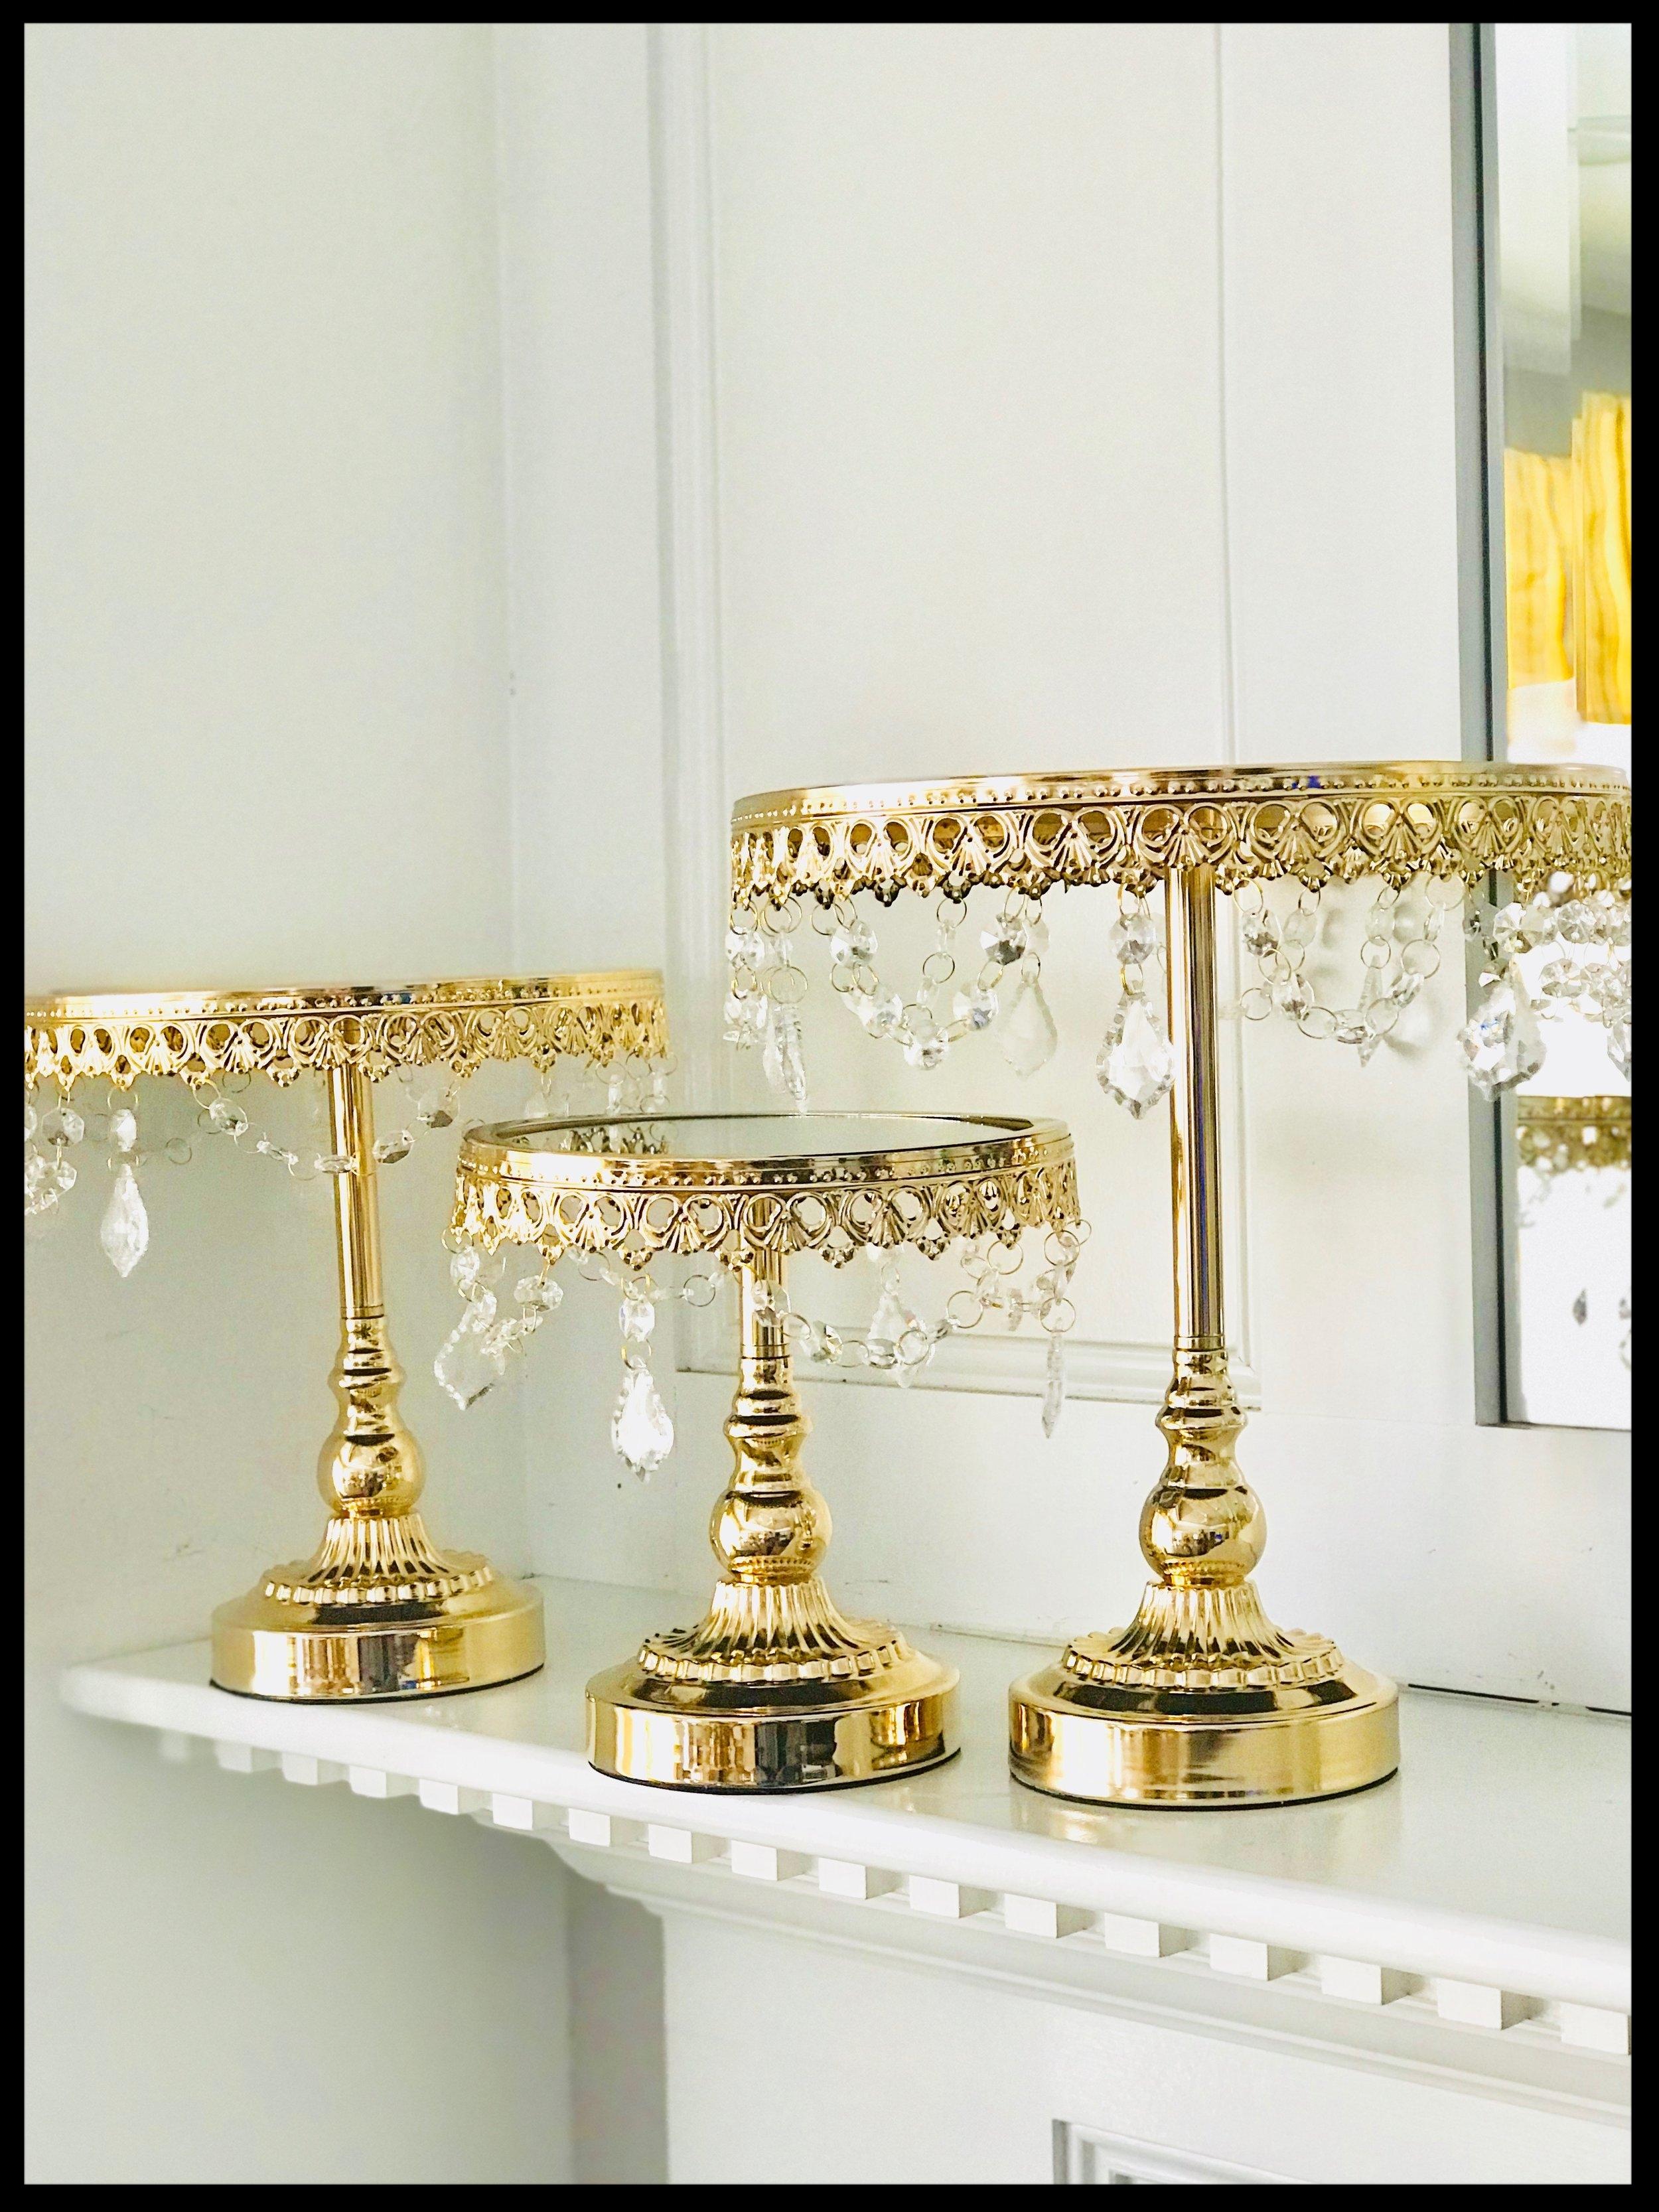 Gold Tiered Dessert Stands